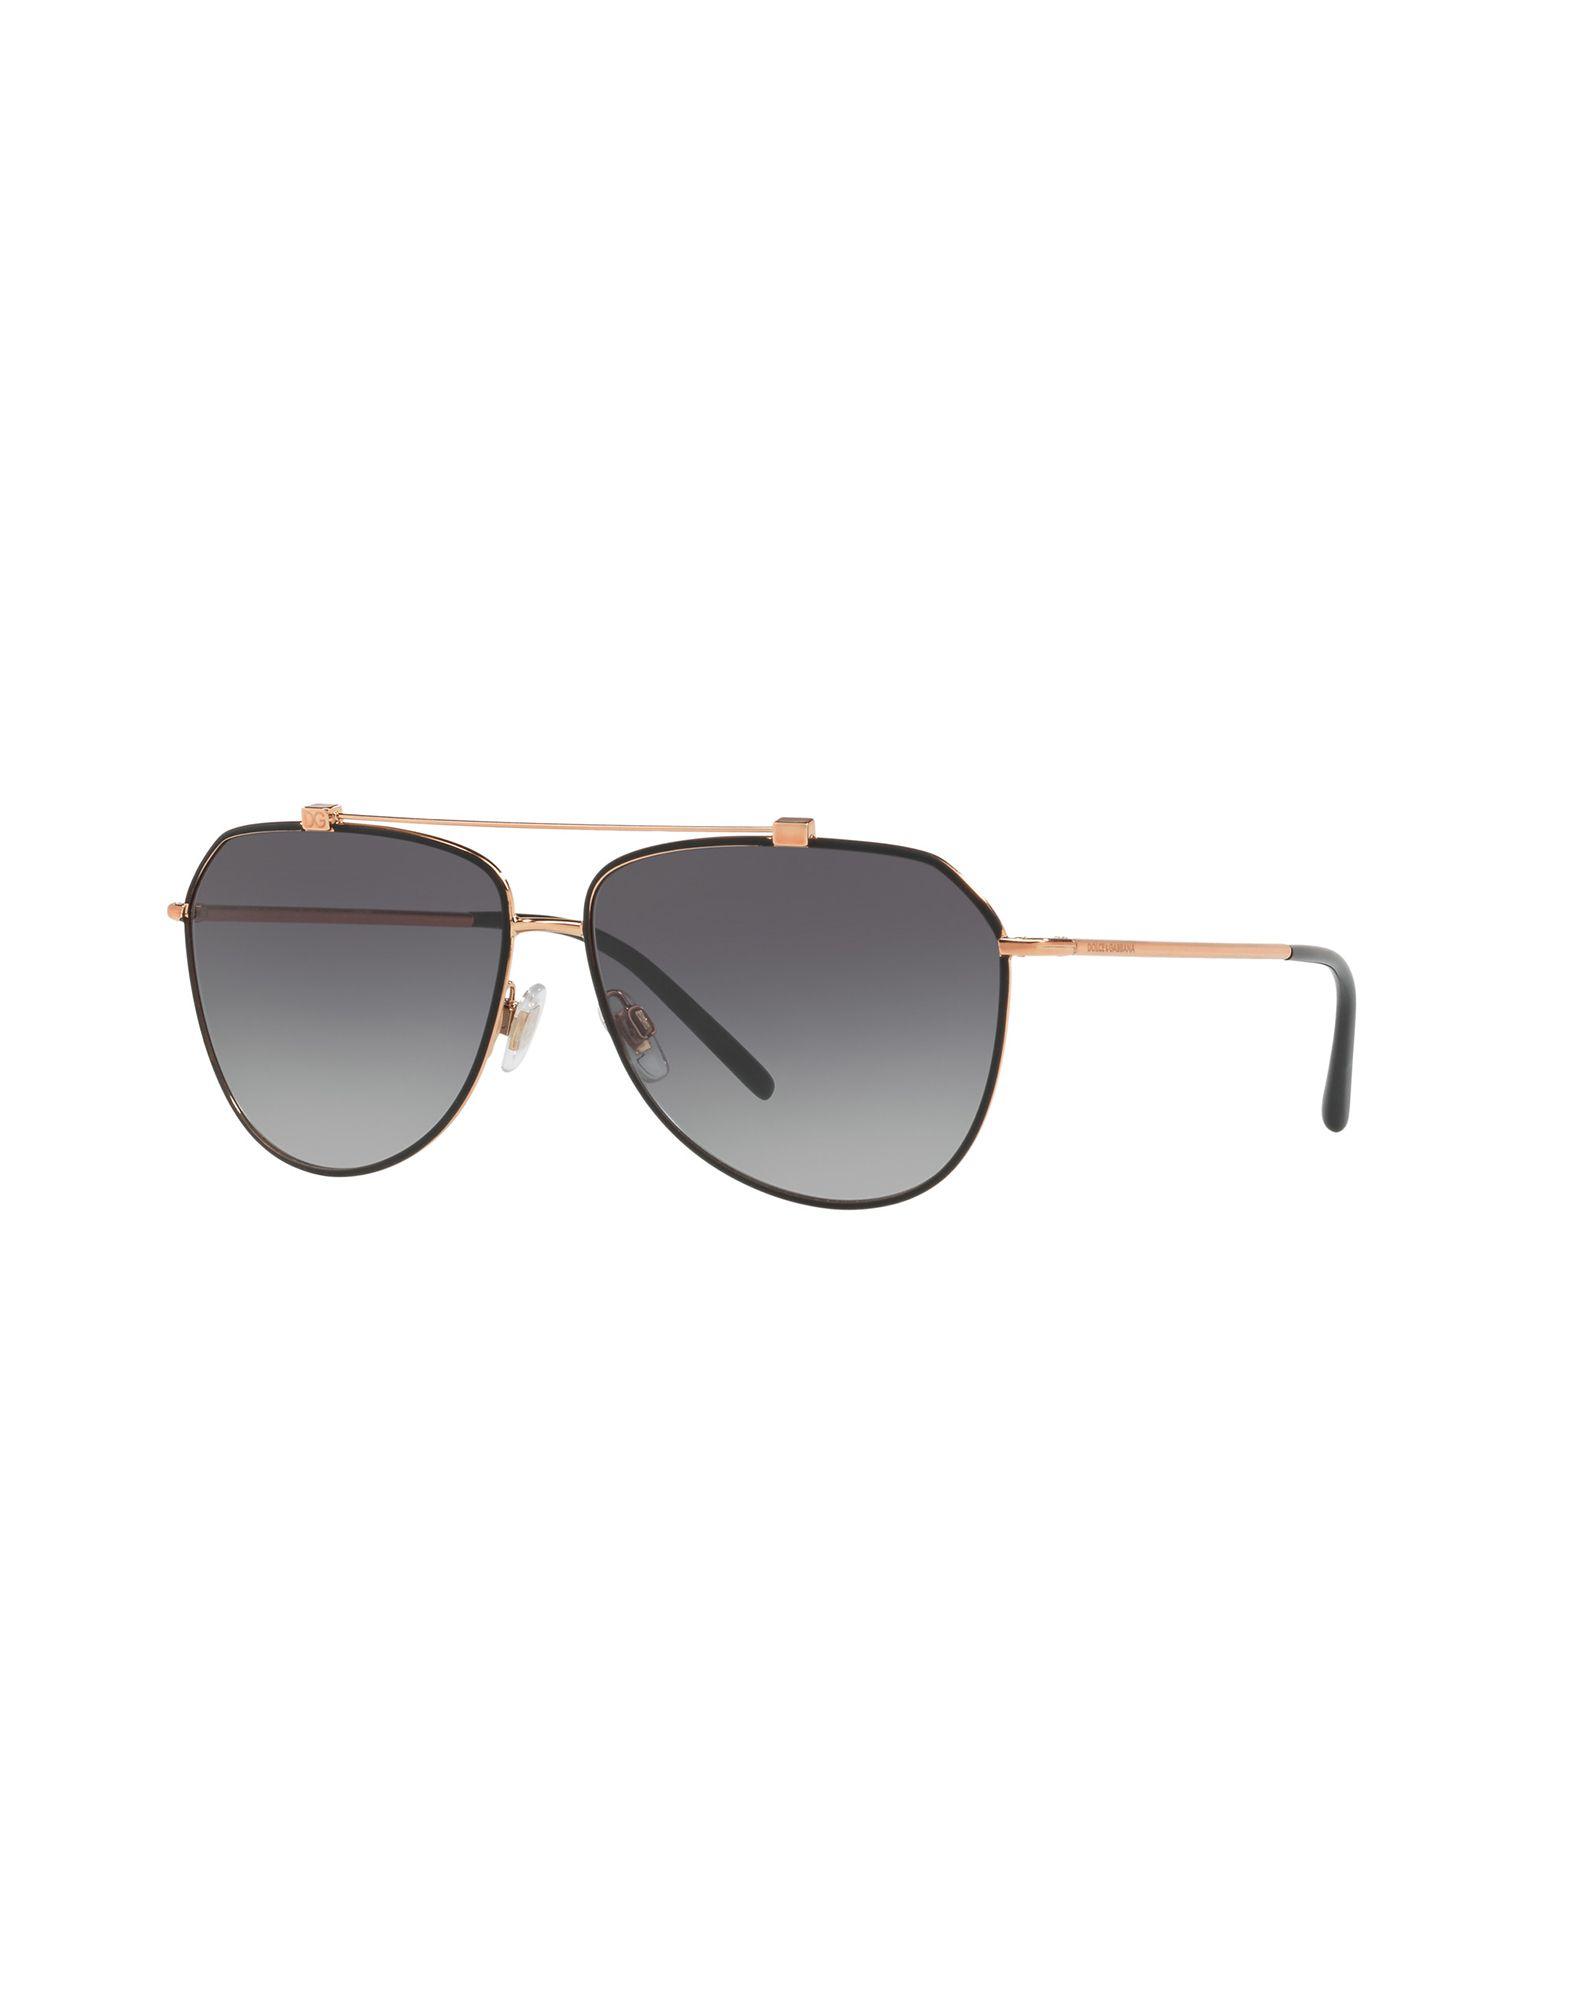 Occhiali Da Sole Dolce & Gabbana Dg2190 - Donna - Acquista online su